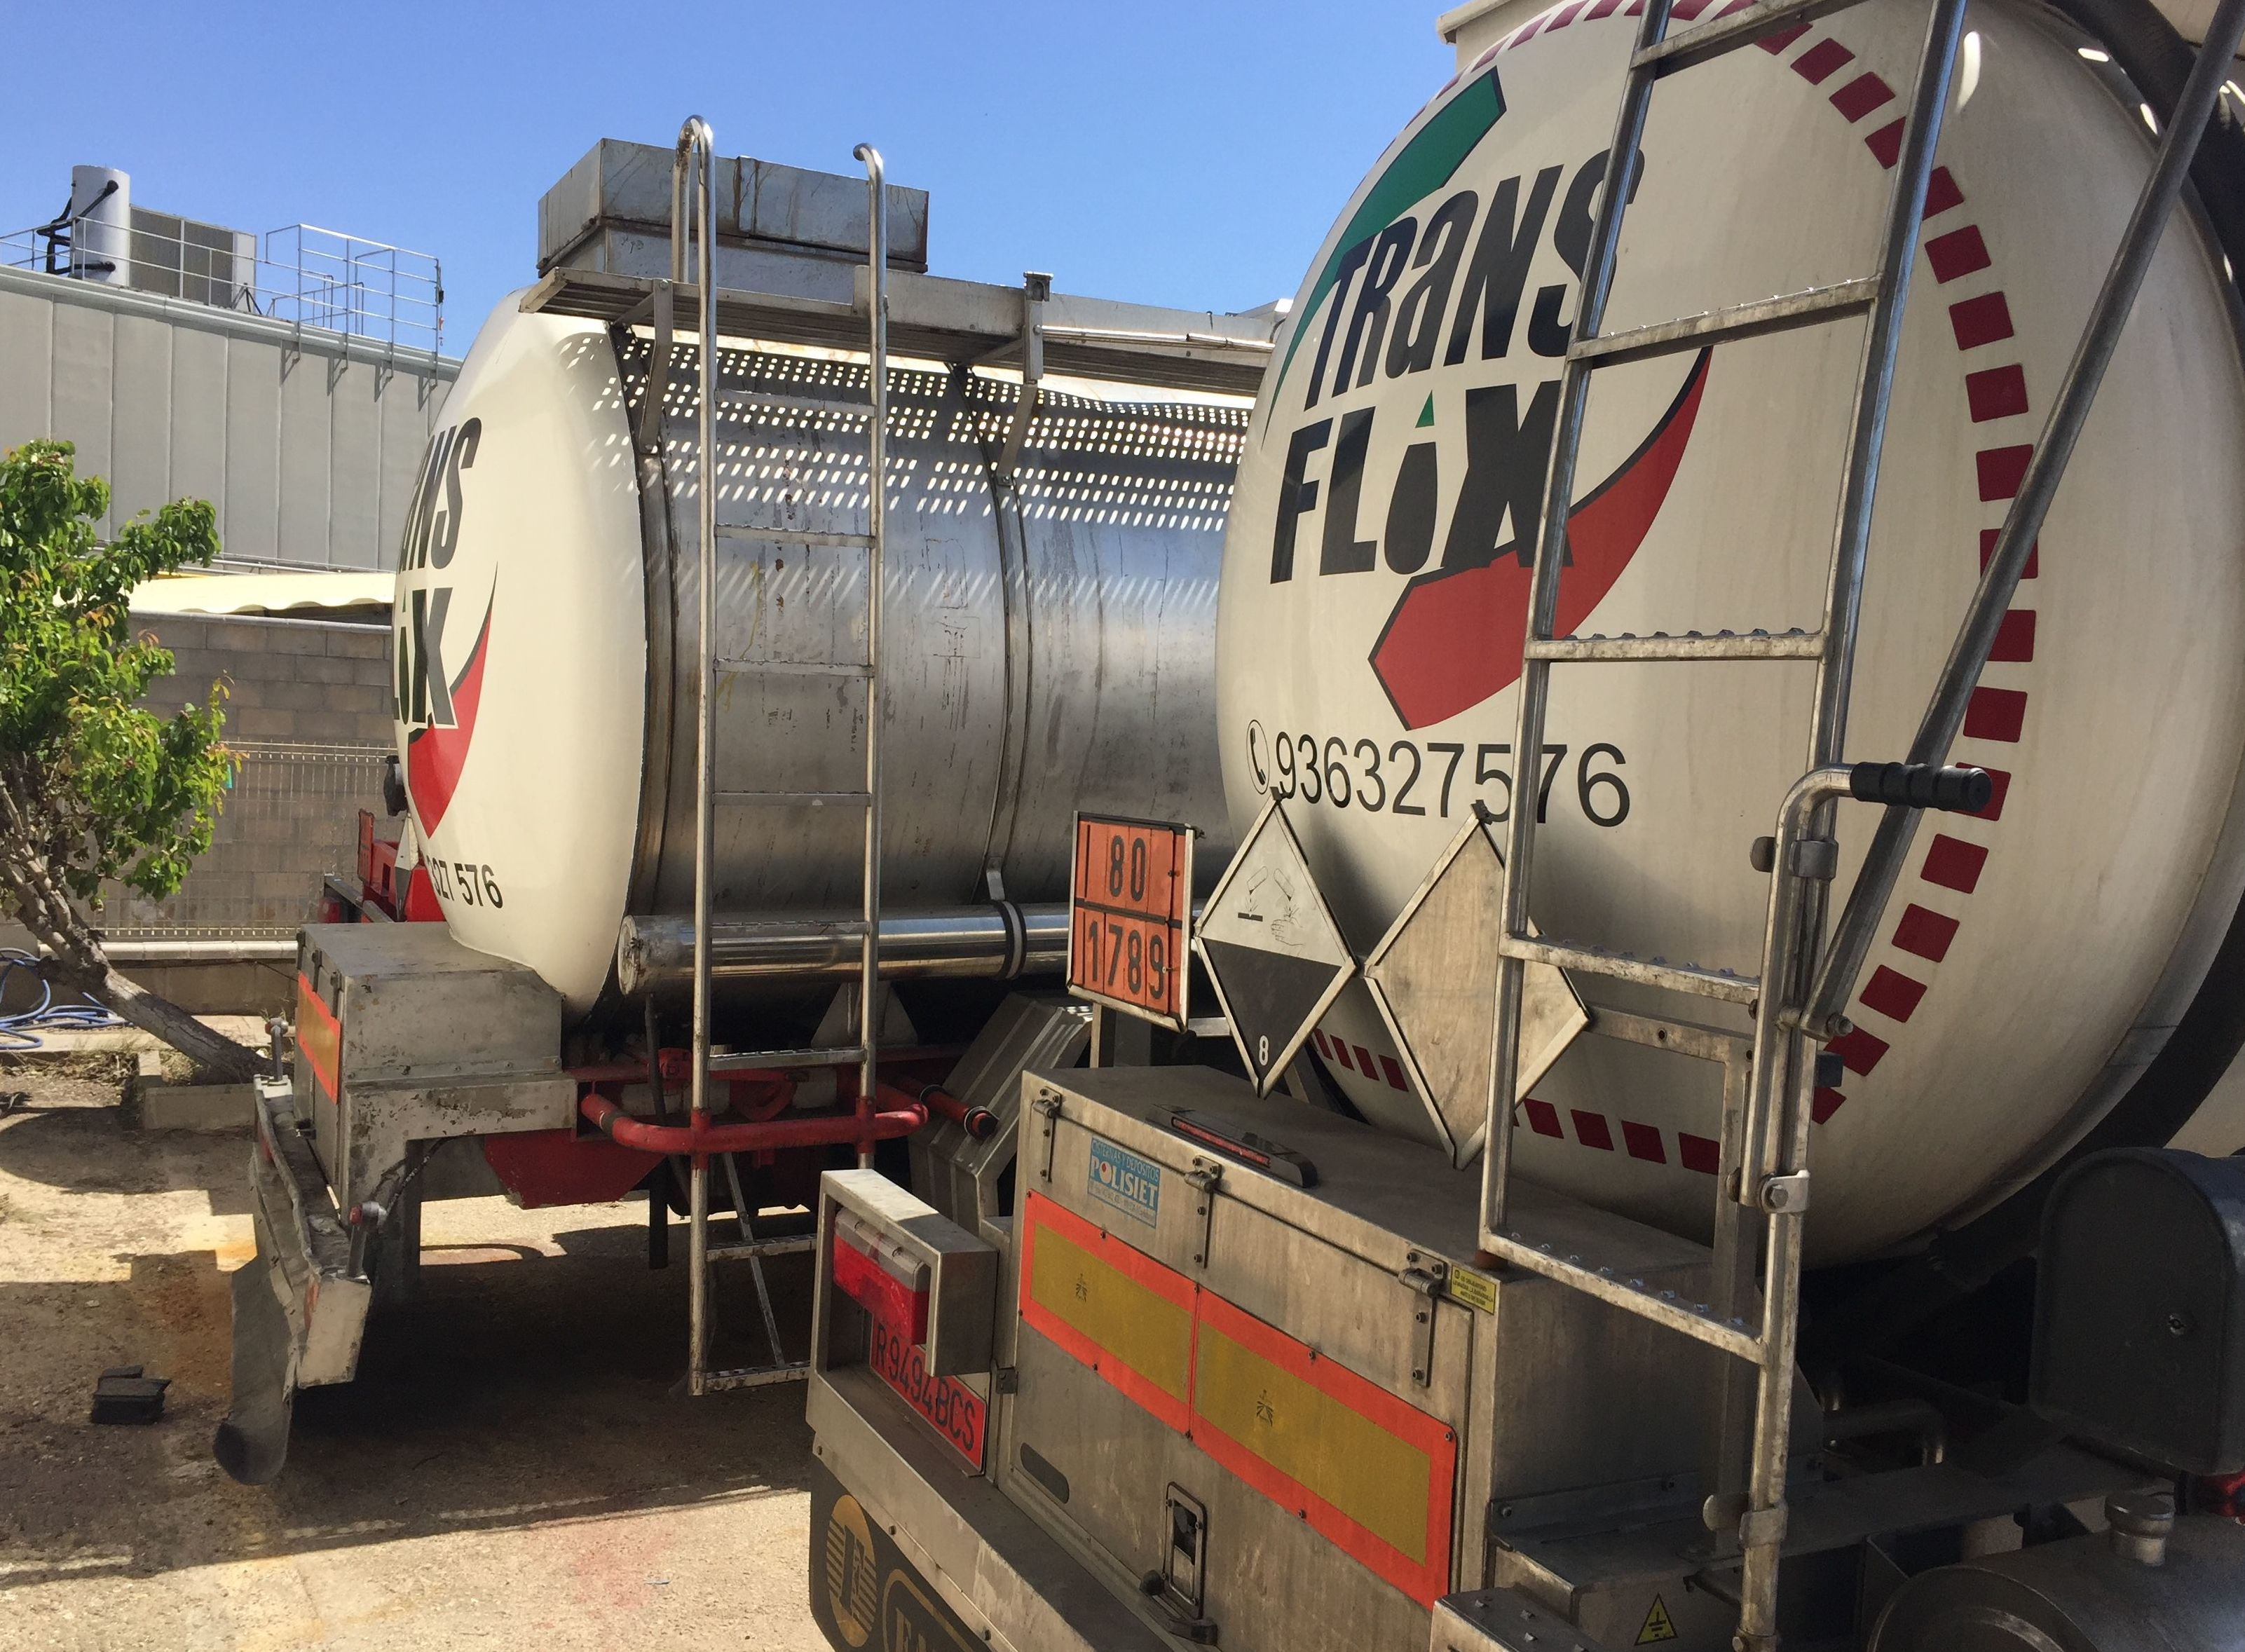 Transporte en cisternas: Servicios de Transportes Flix, S.A.